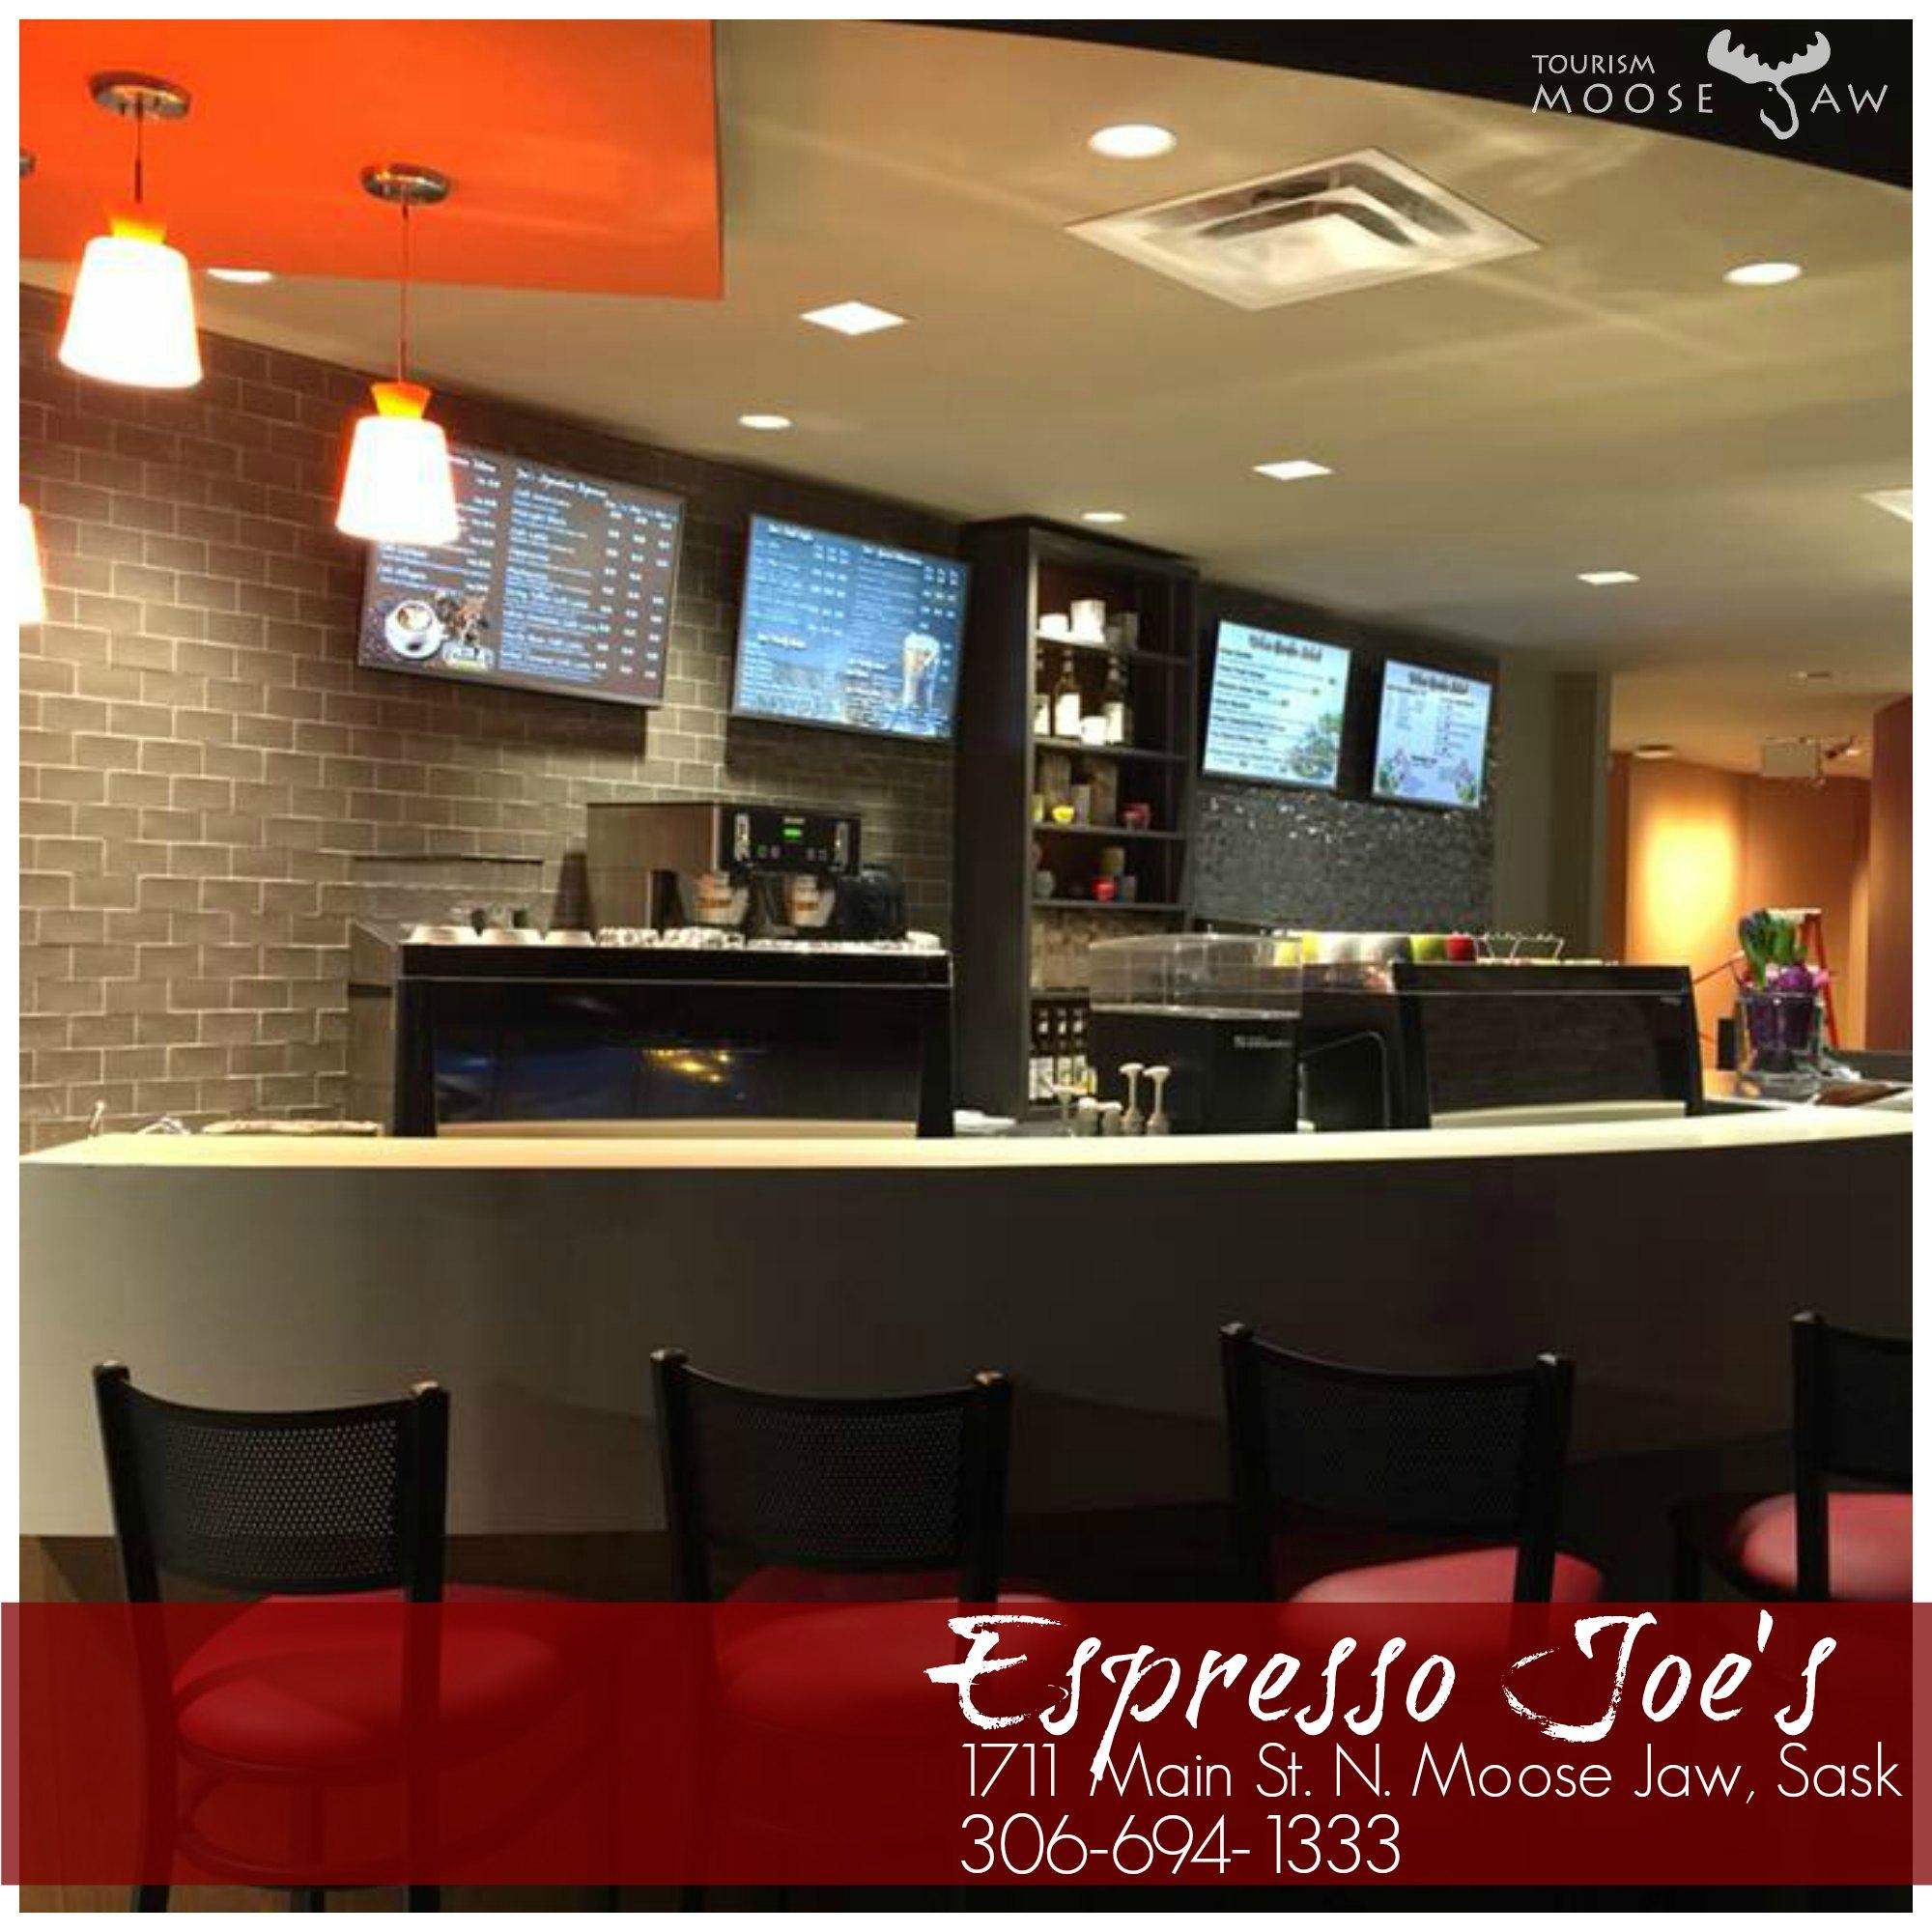 Espresso Joe's.jpg